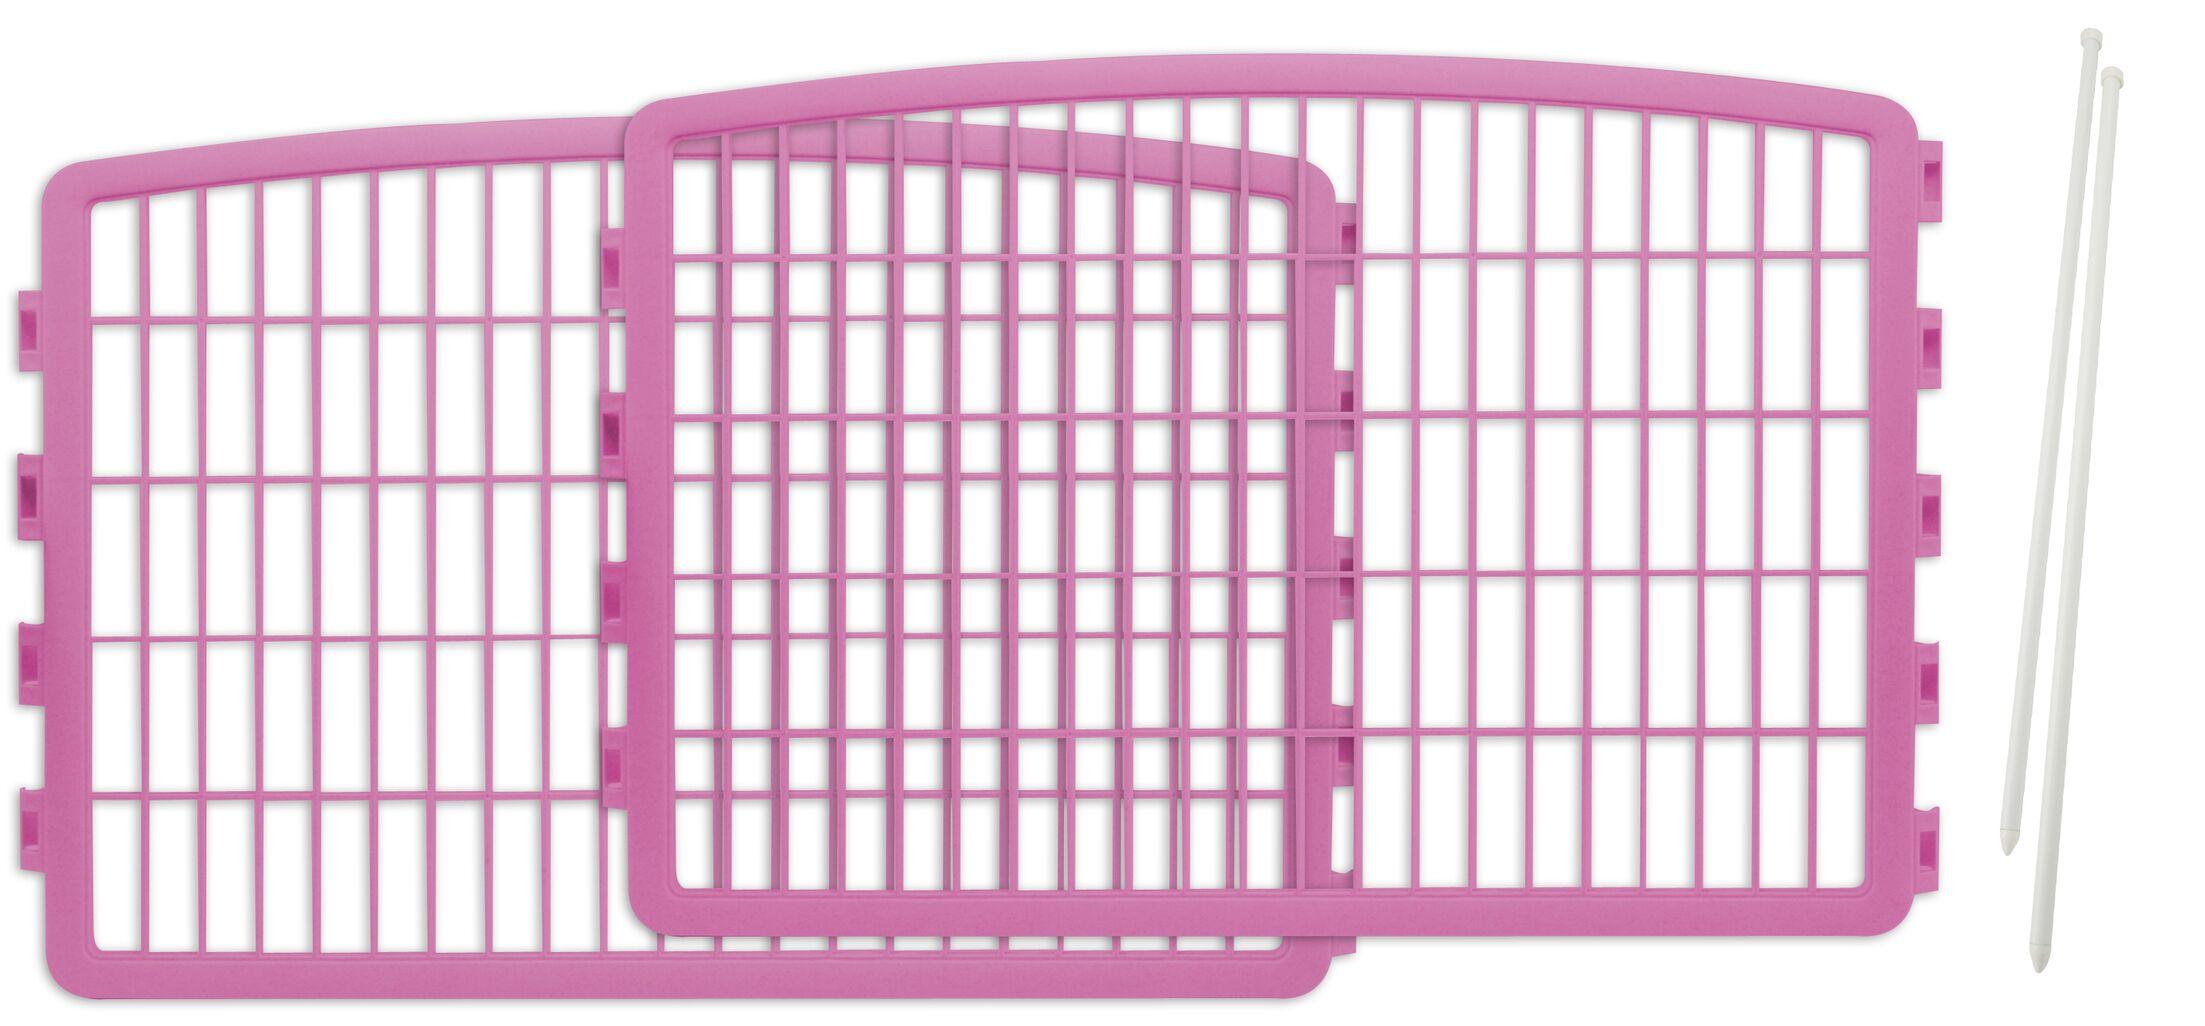 Moris Expansion Kit for Indoor/Outdoor Plastic Pet Pen Color: Pink